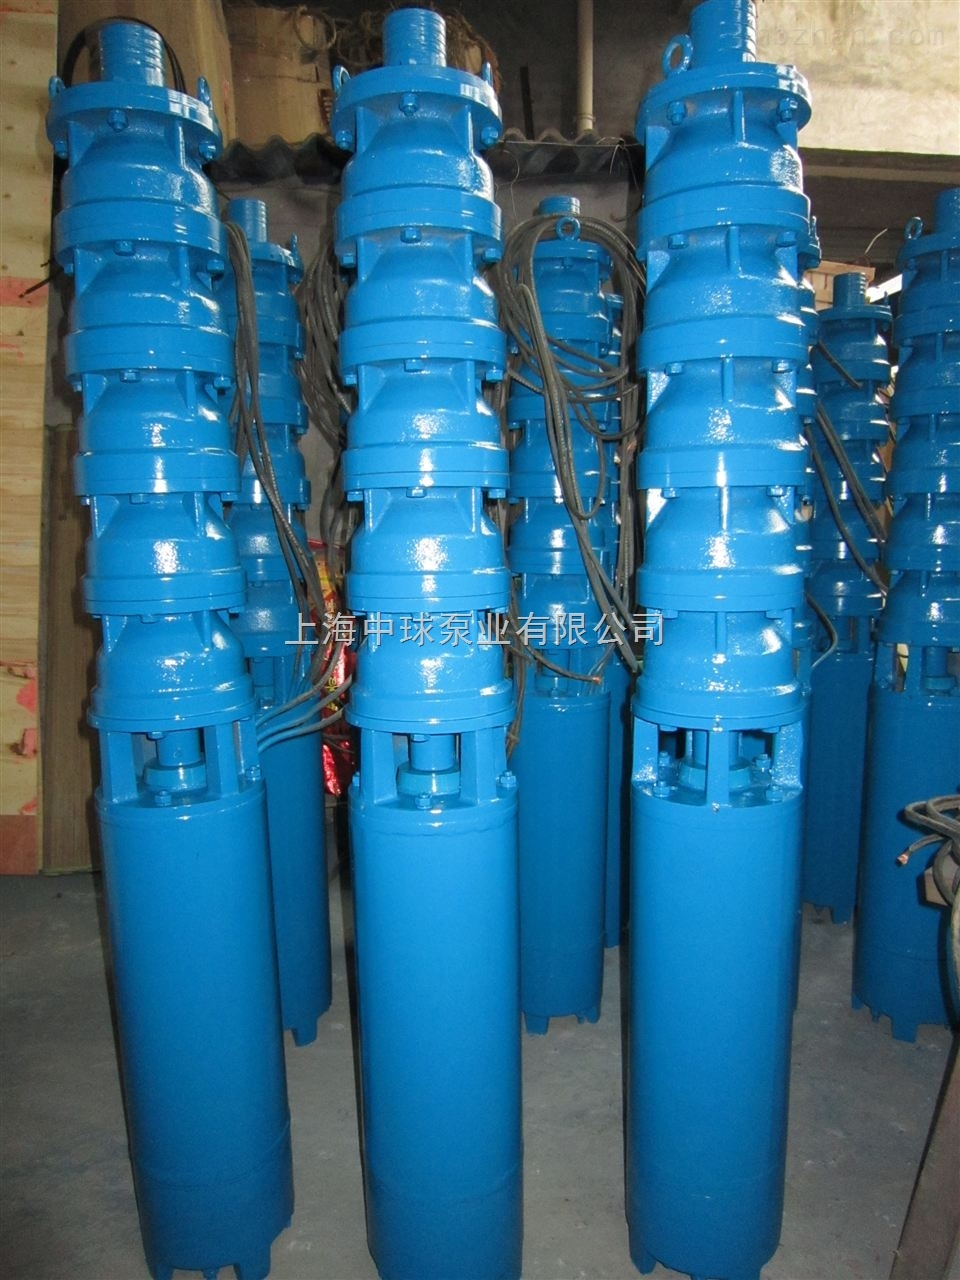 200qj80-66/6深井潜水泵